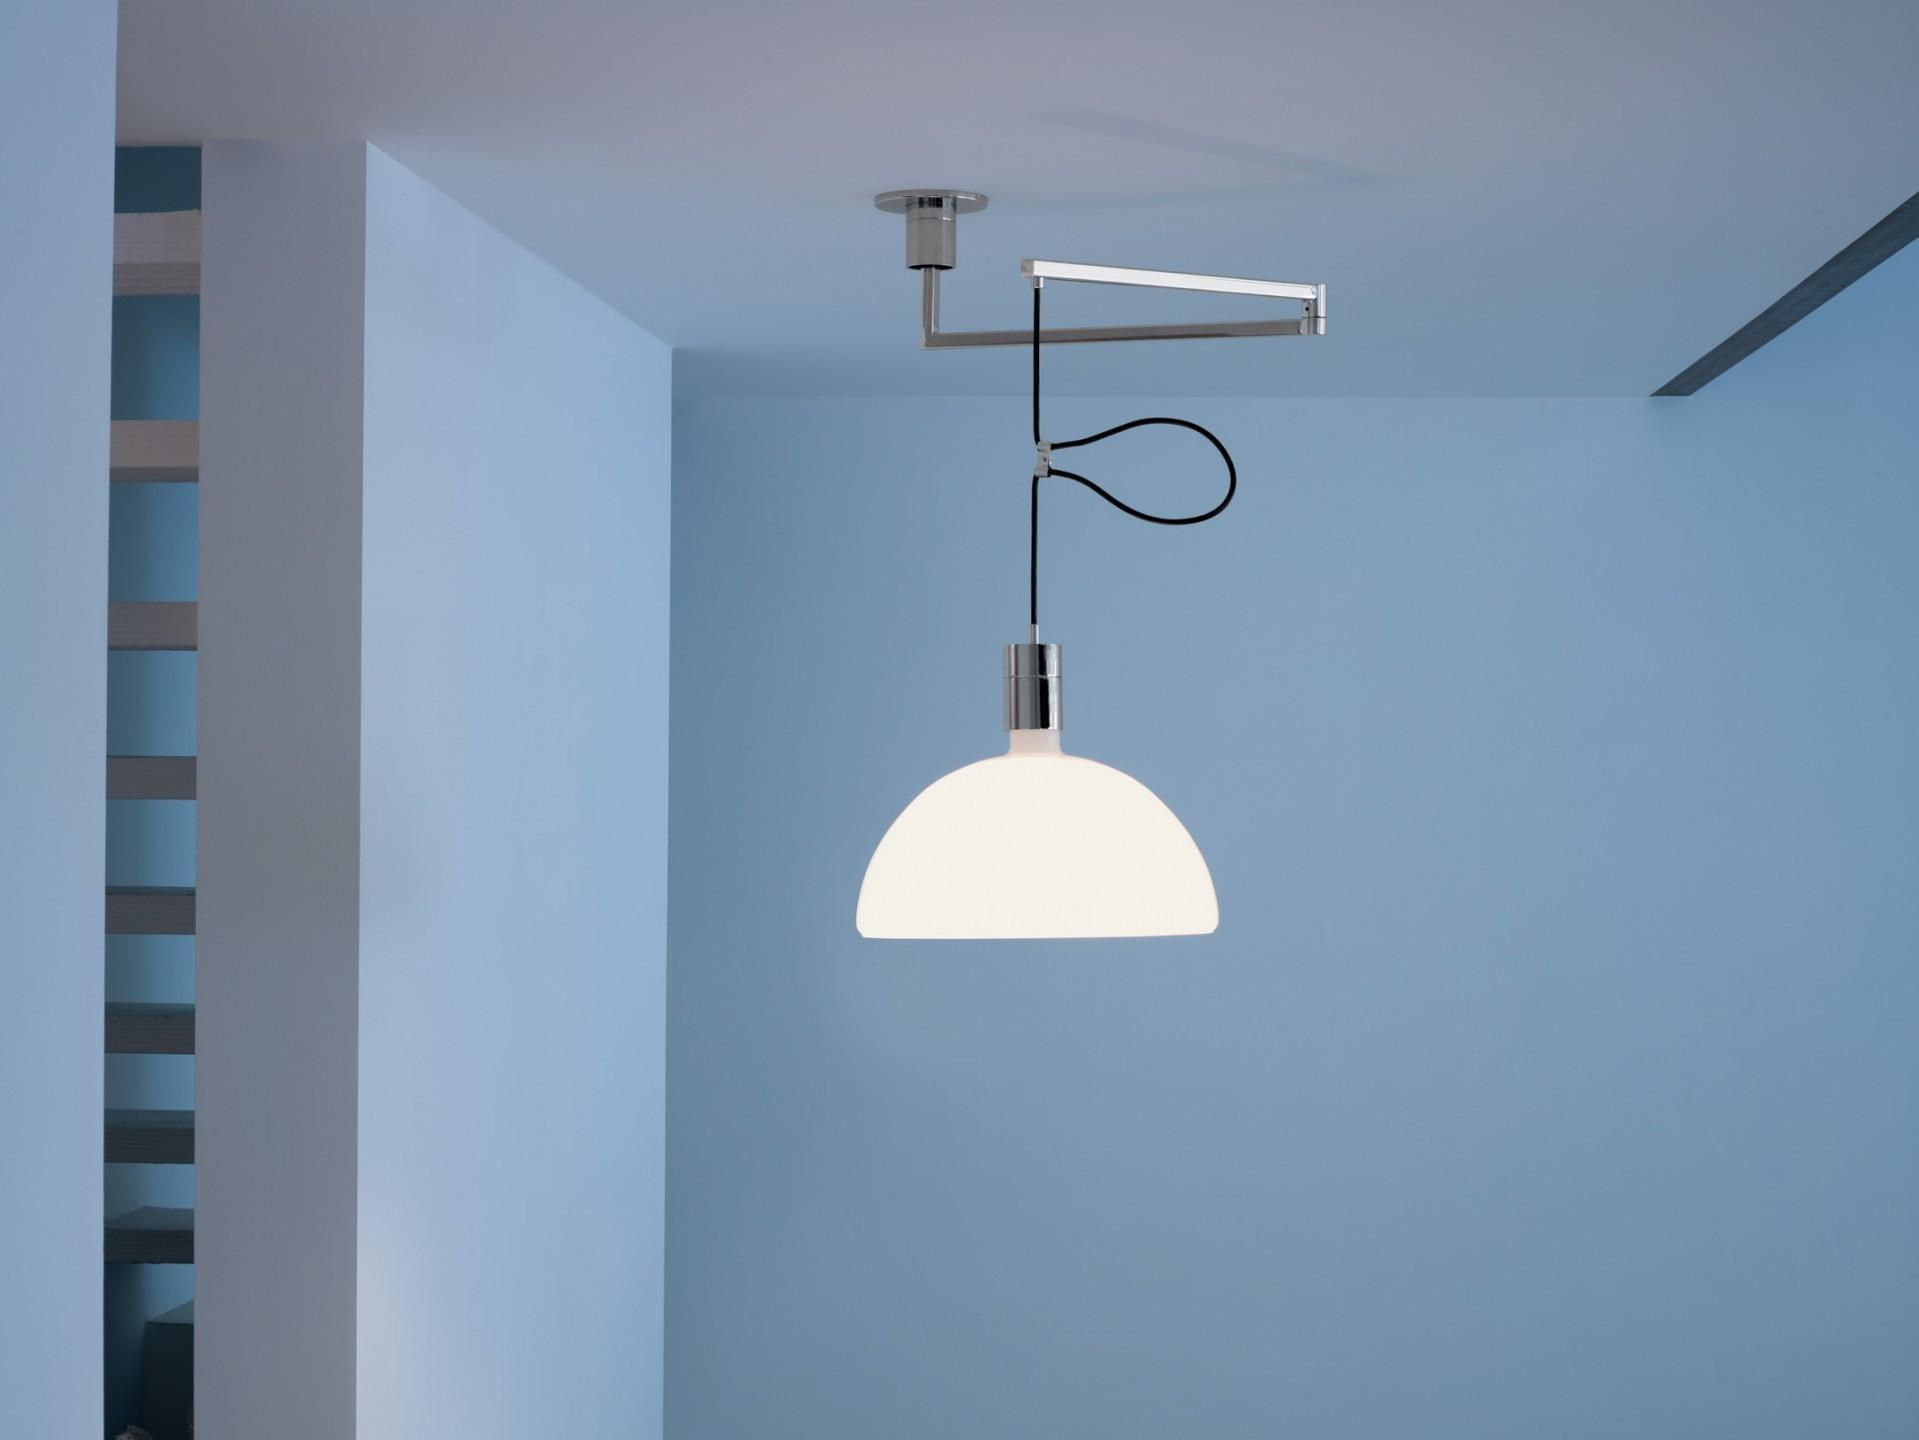 Lampadario Con Punto Luce Decentrato nemo - as41c sospensione decentrata vetro - puntoluce